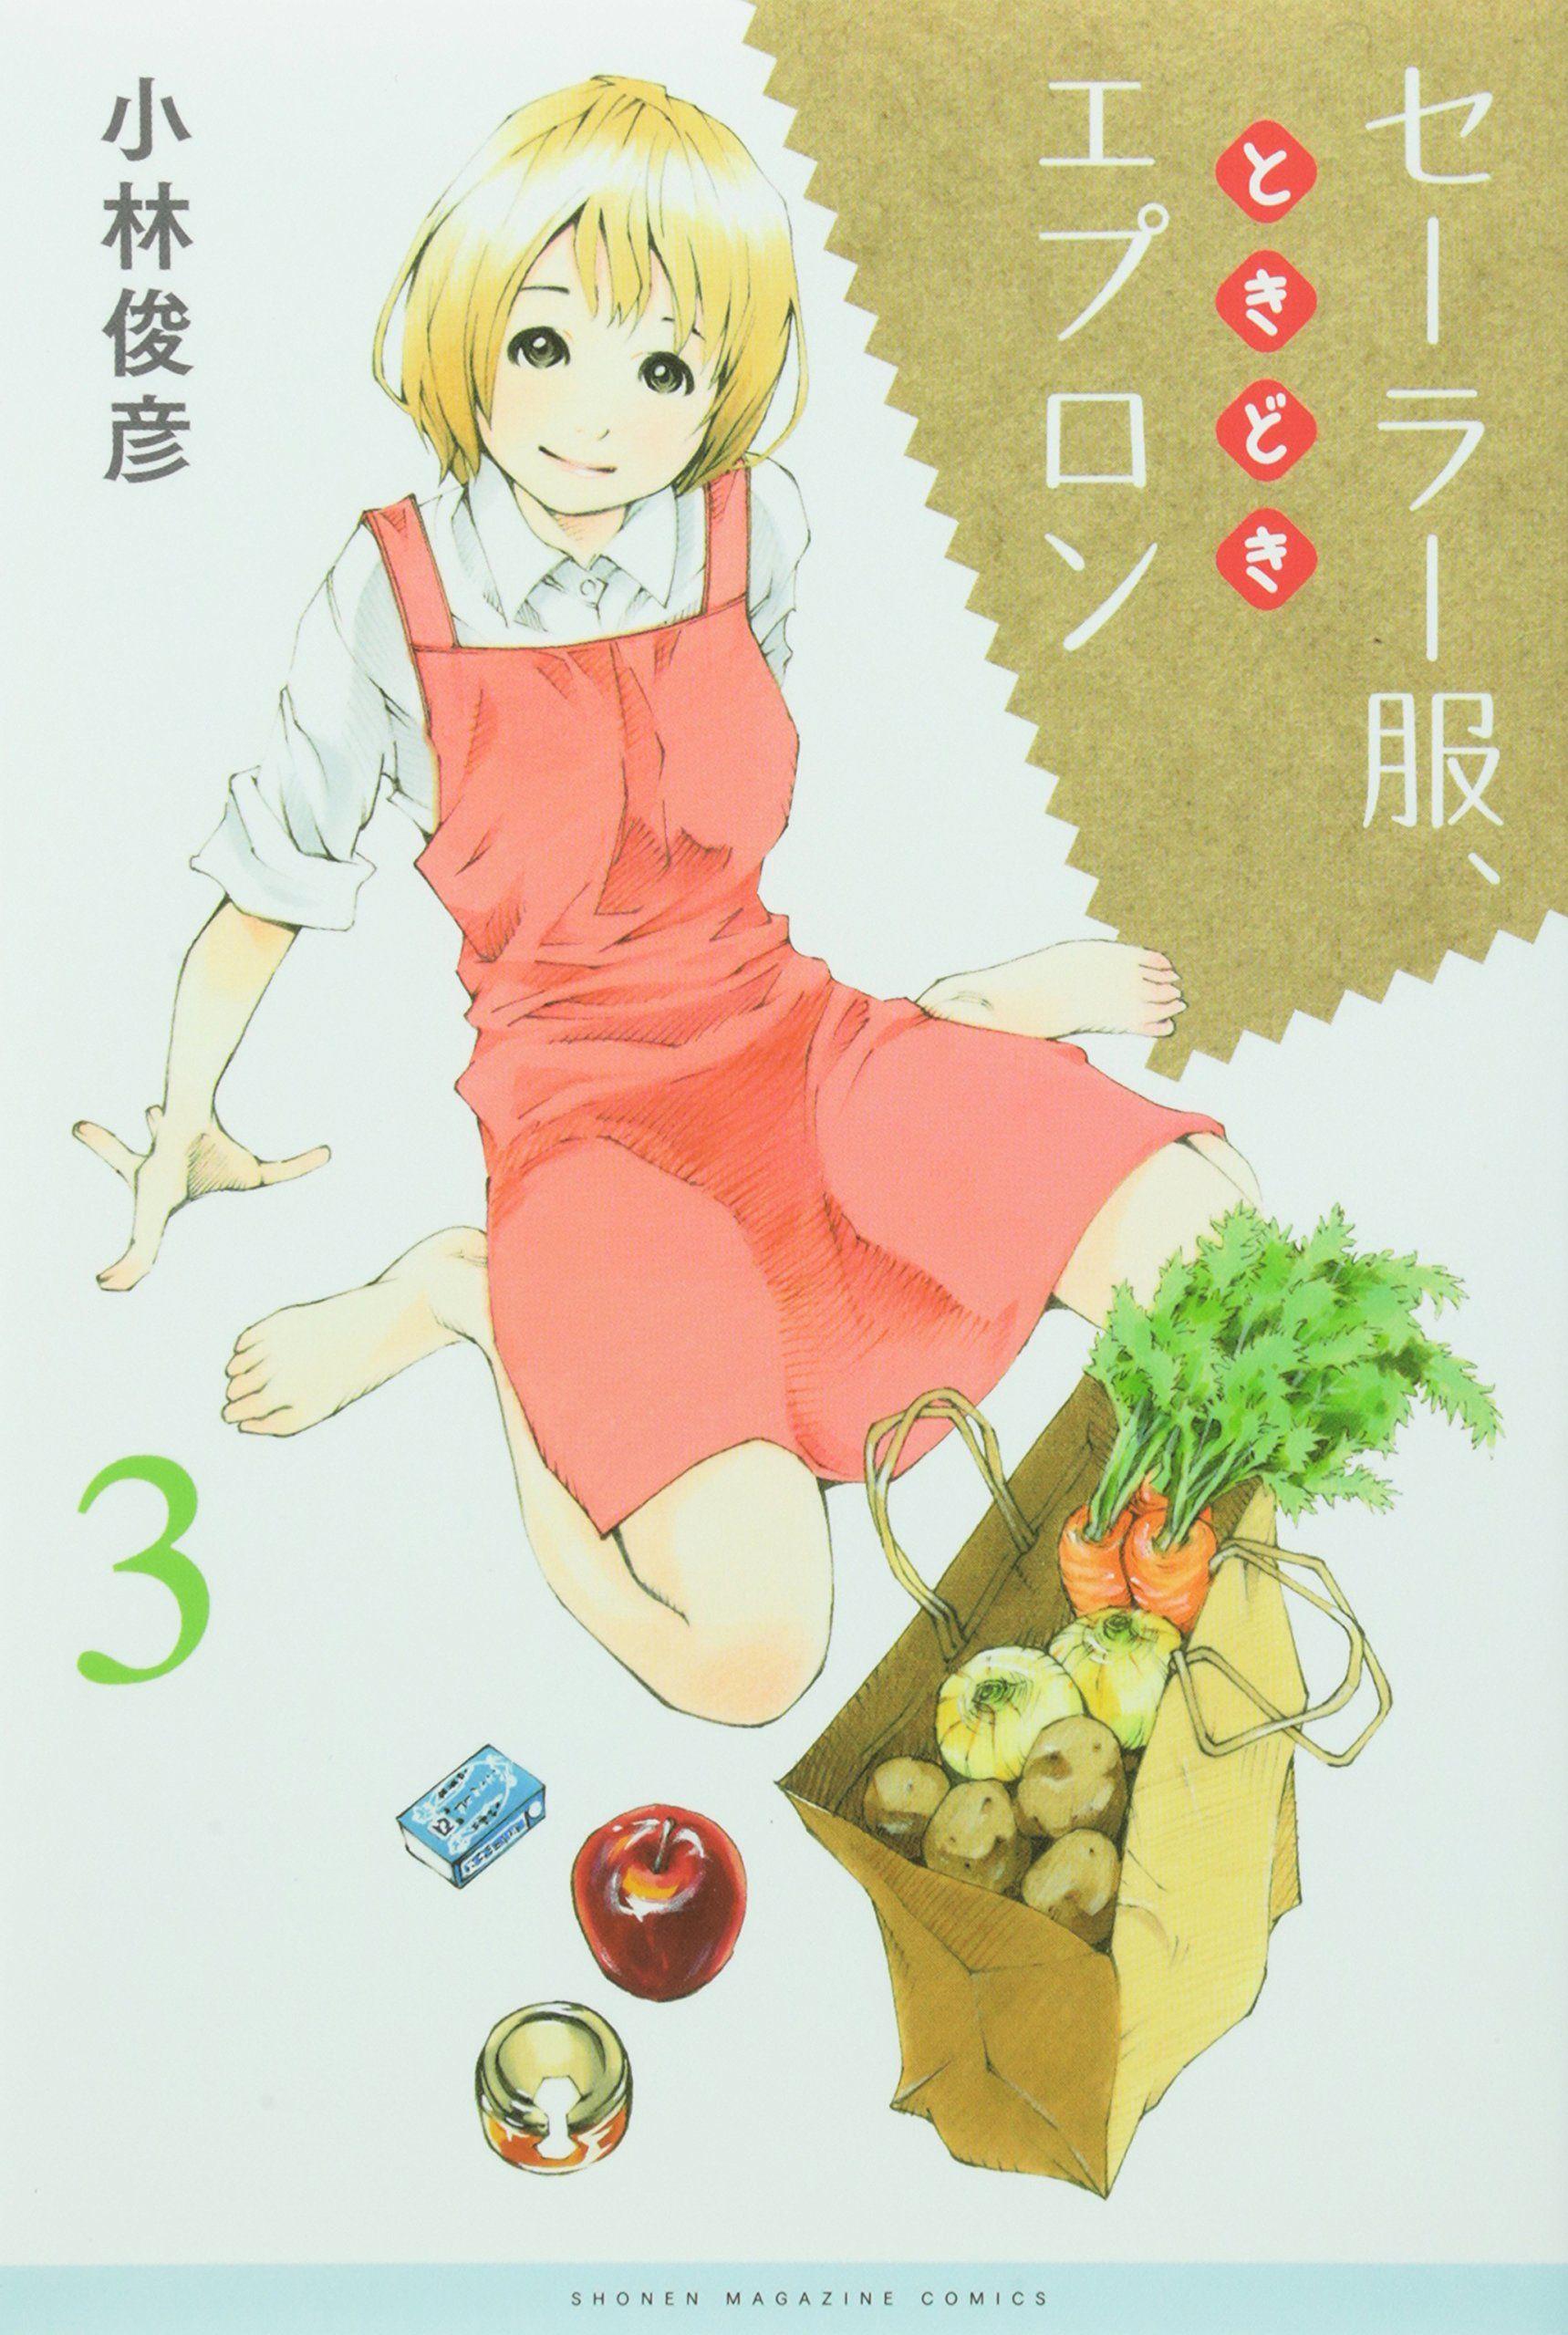 Amazon.co.jp: セーラー服、ときどきエプロン(3) (講談社コミックス): 小林 俊彦: 本